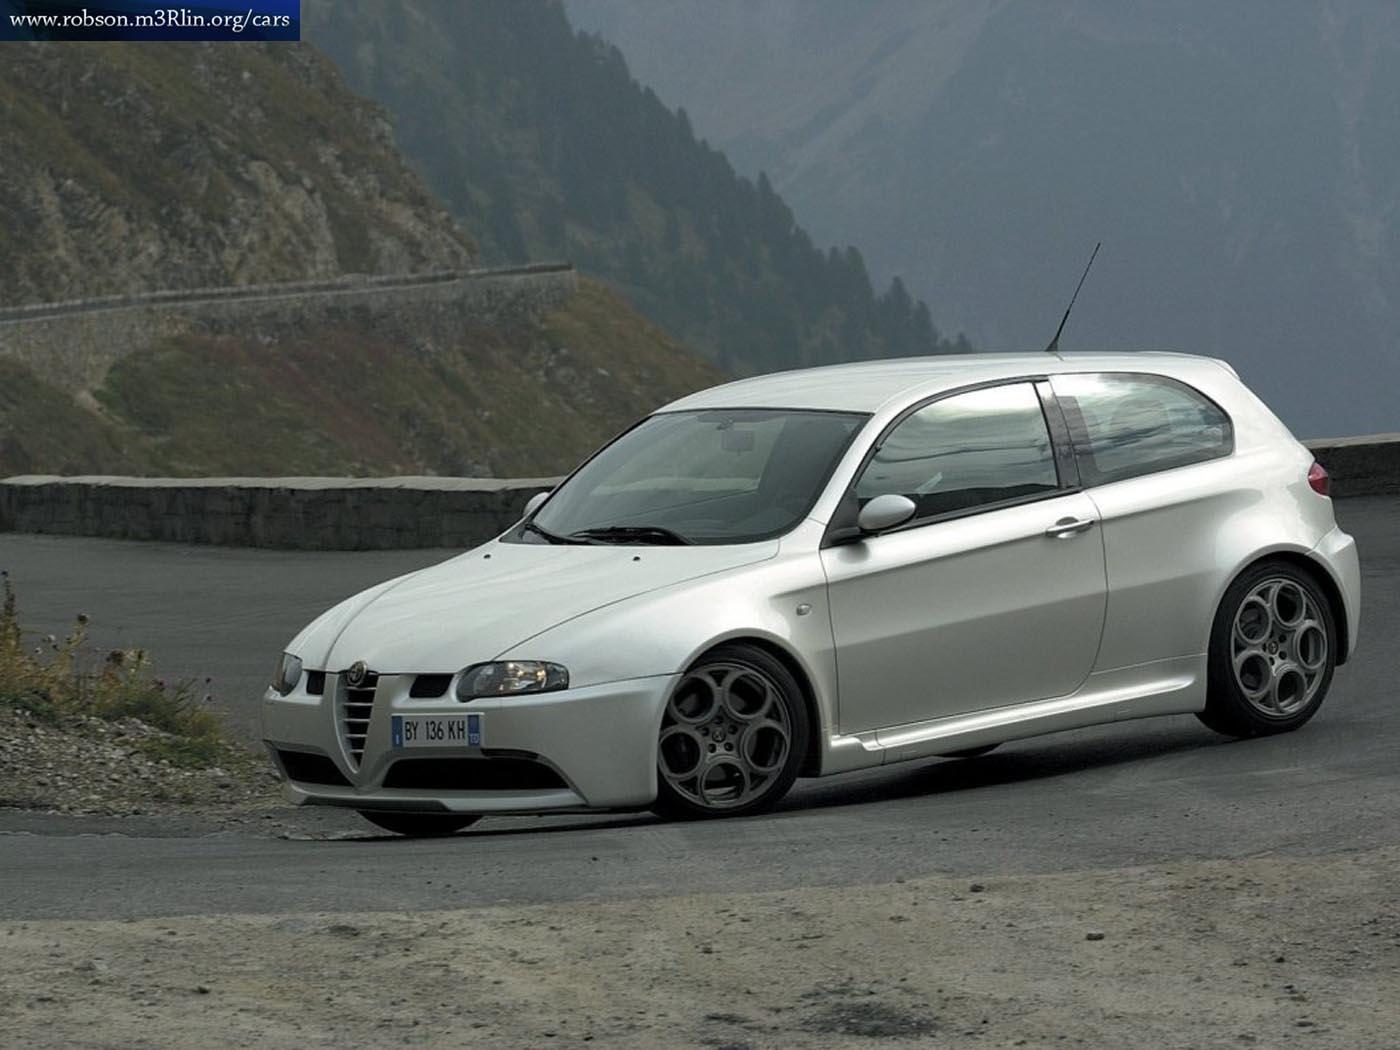 Alfa Romeo Gta Review And Photos Magnesium Wheels Blue